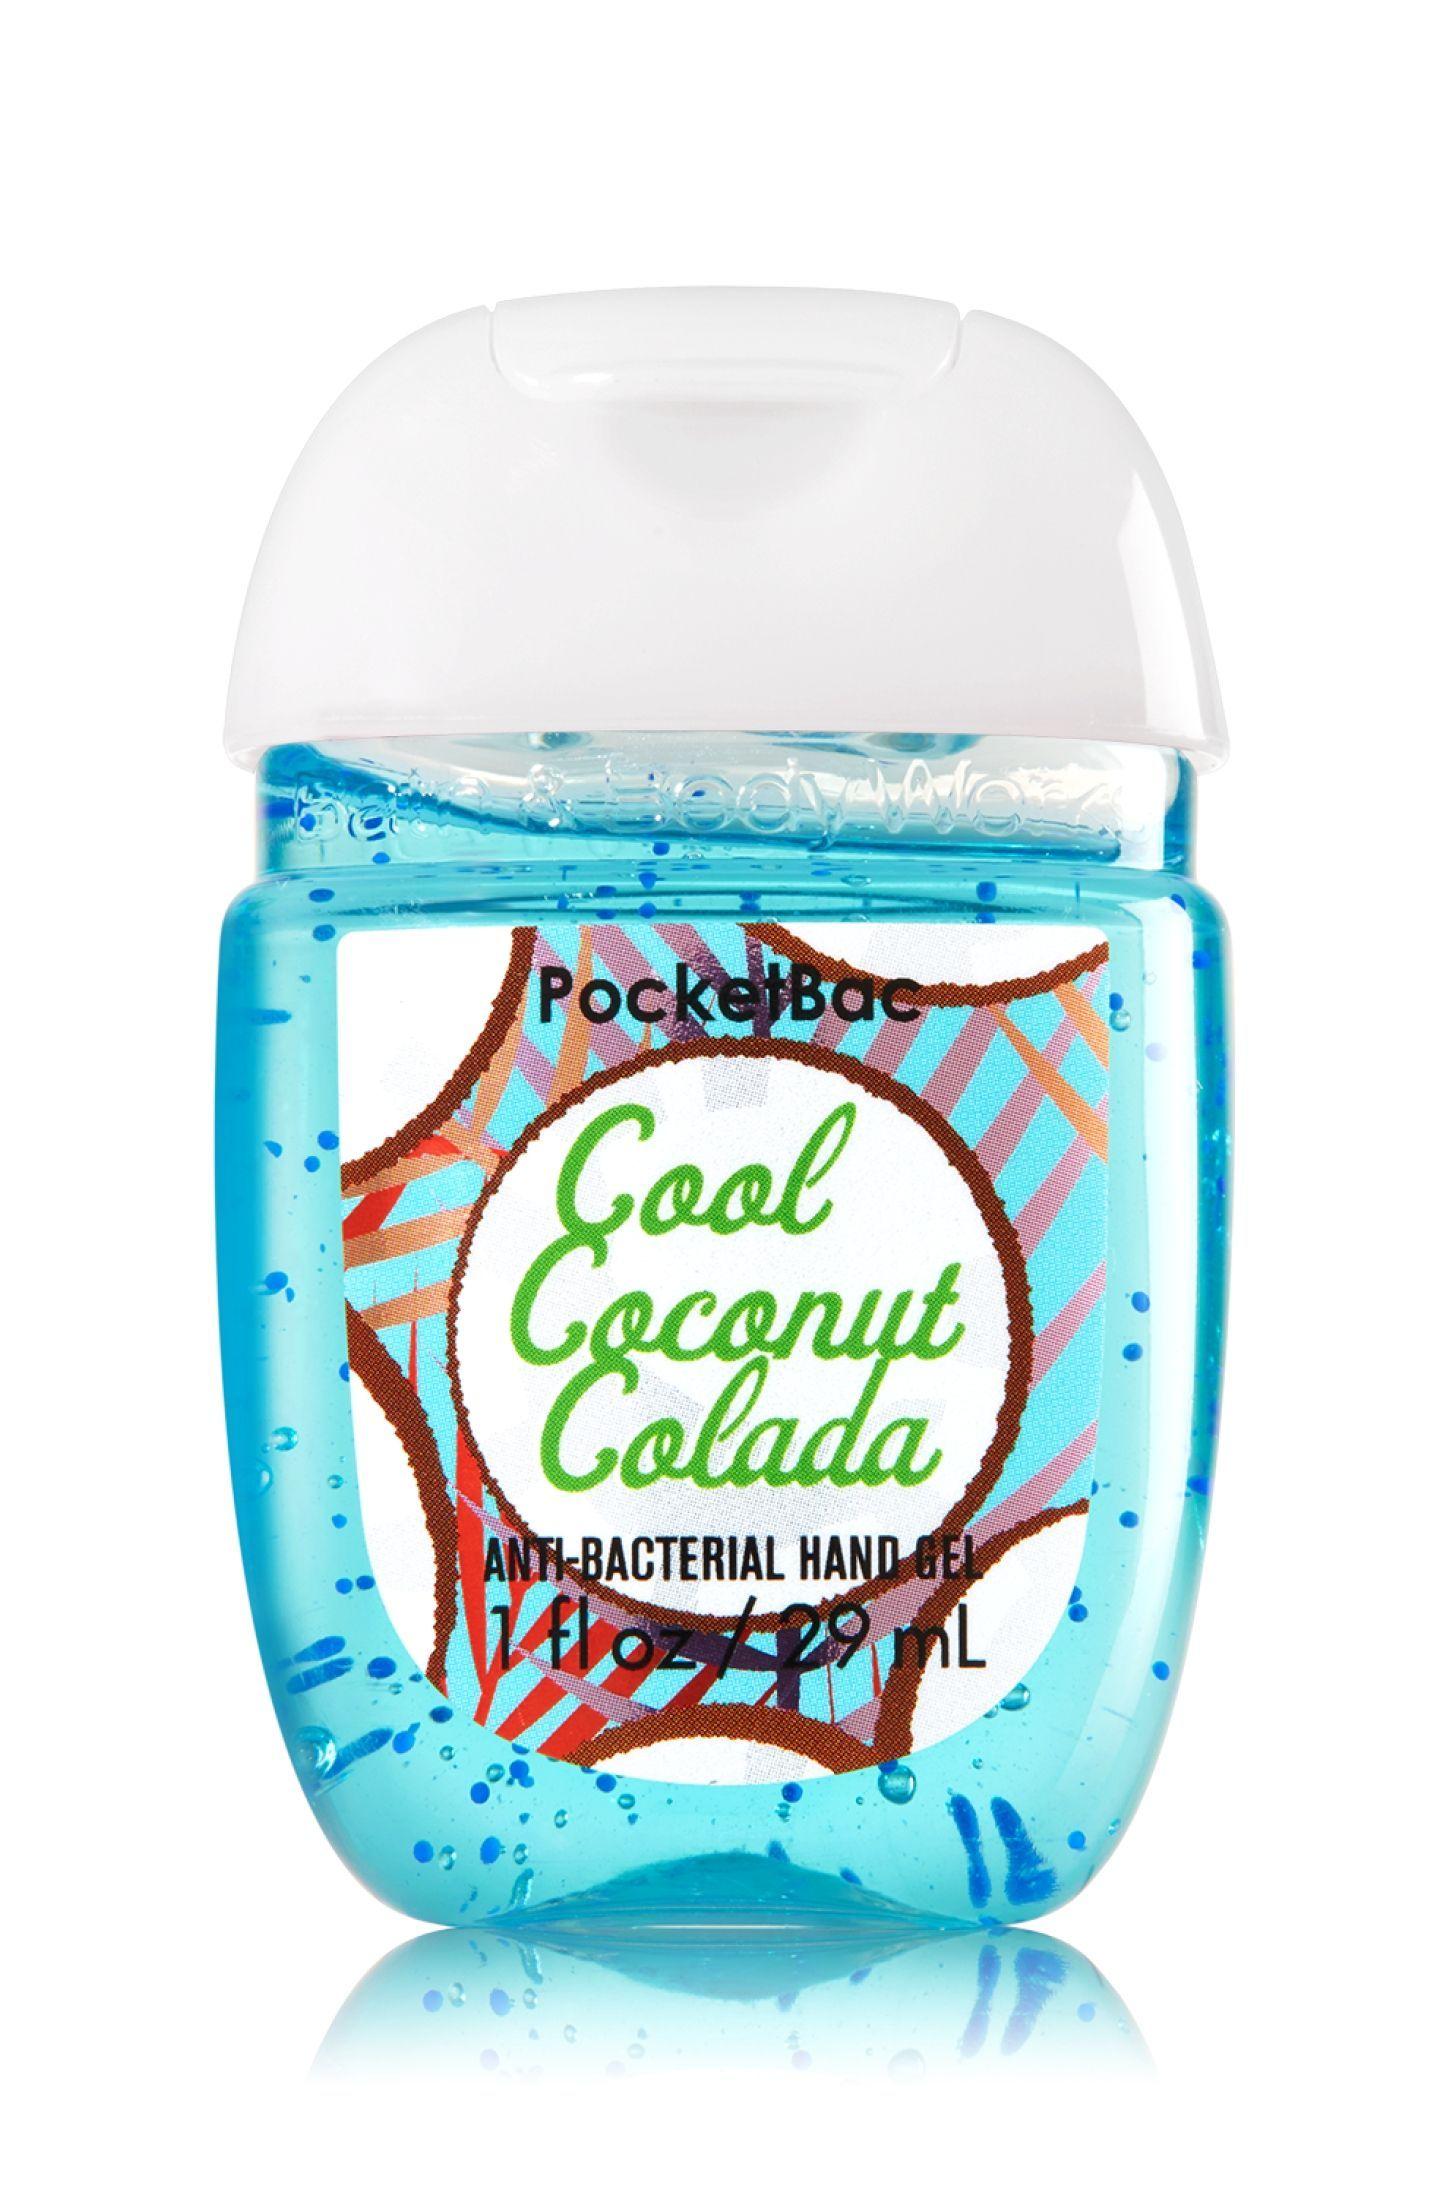 Cool Coconut Colada Pocketbac Sanitizing Hand Gel Soap Sanitizer